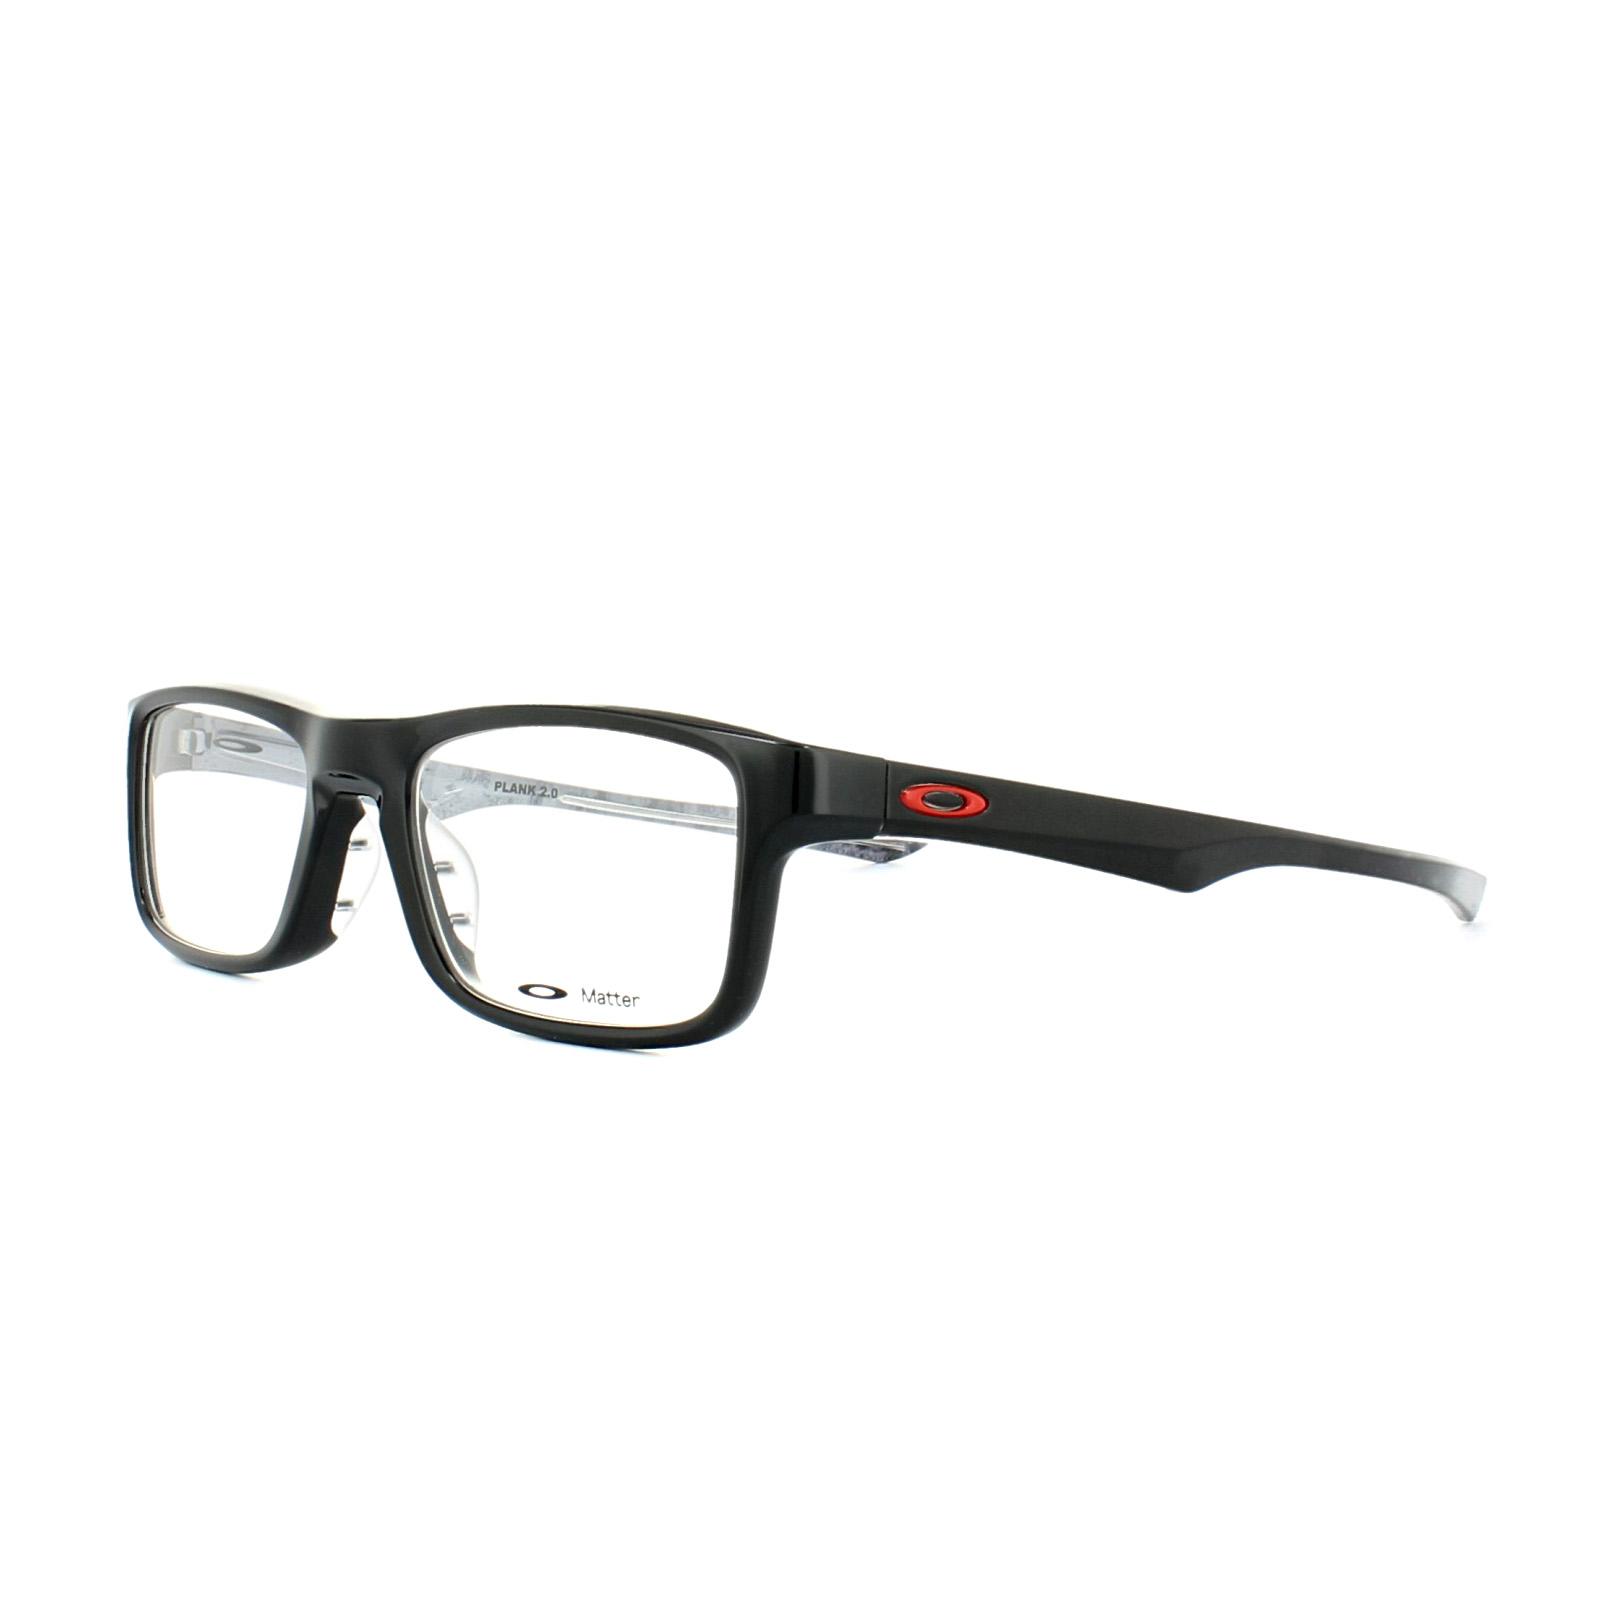 15e839cc47 Oakley Glasses Frames Plank 2.0 OX8081-02 Polished Black